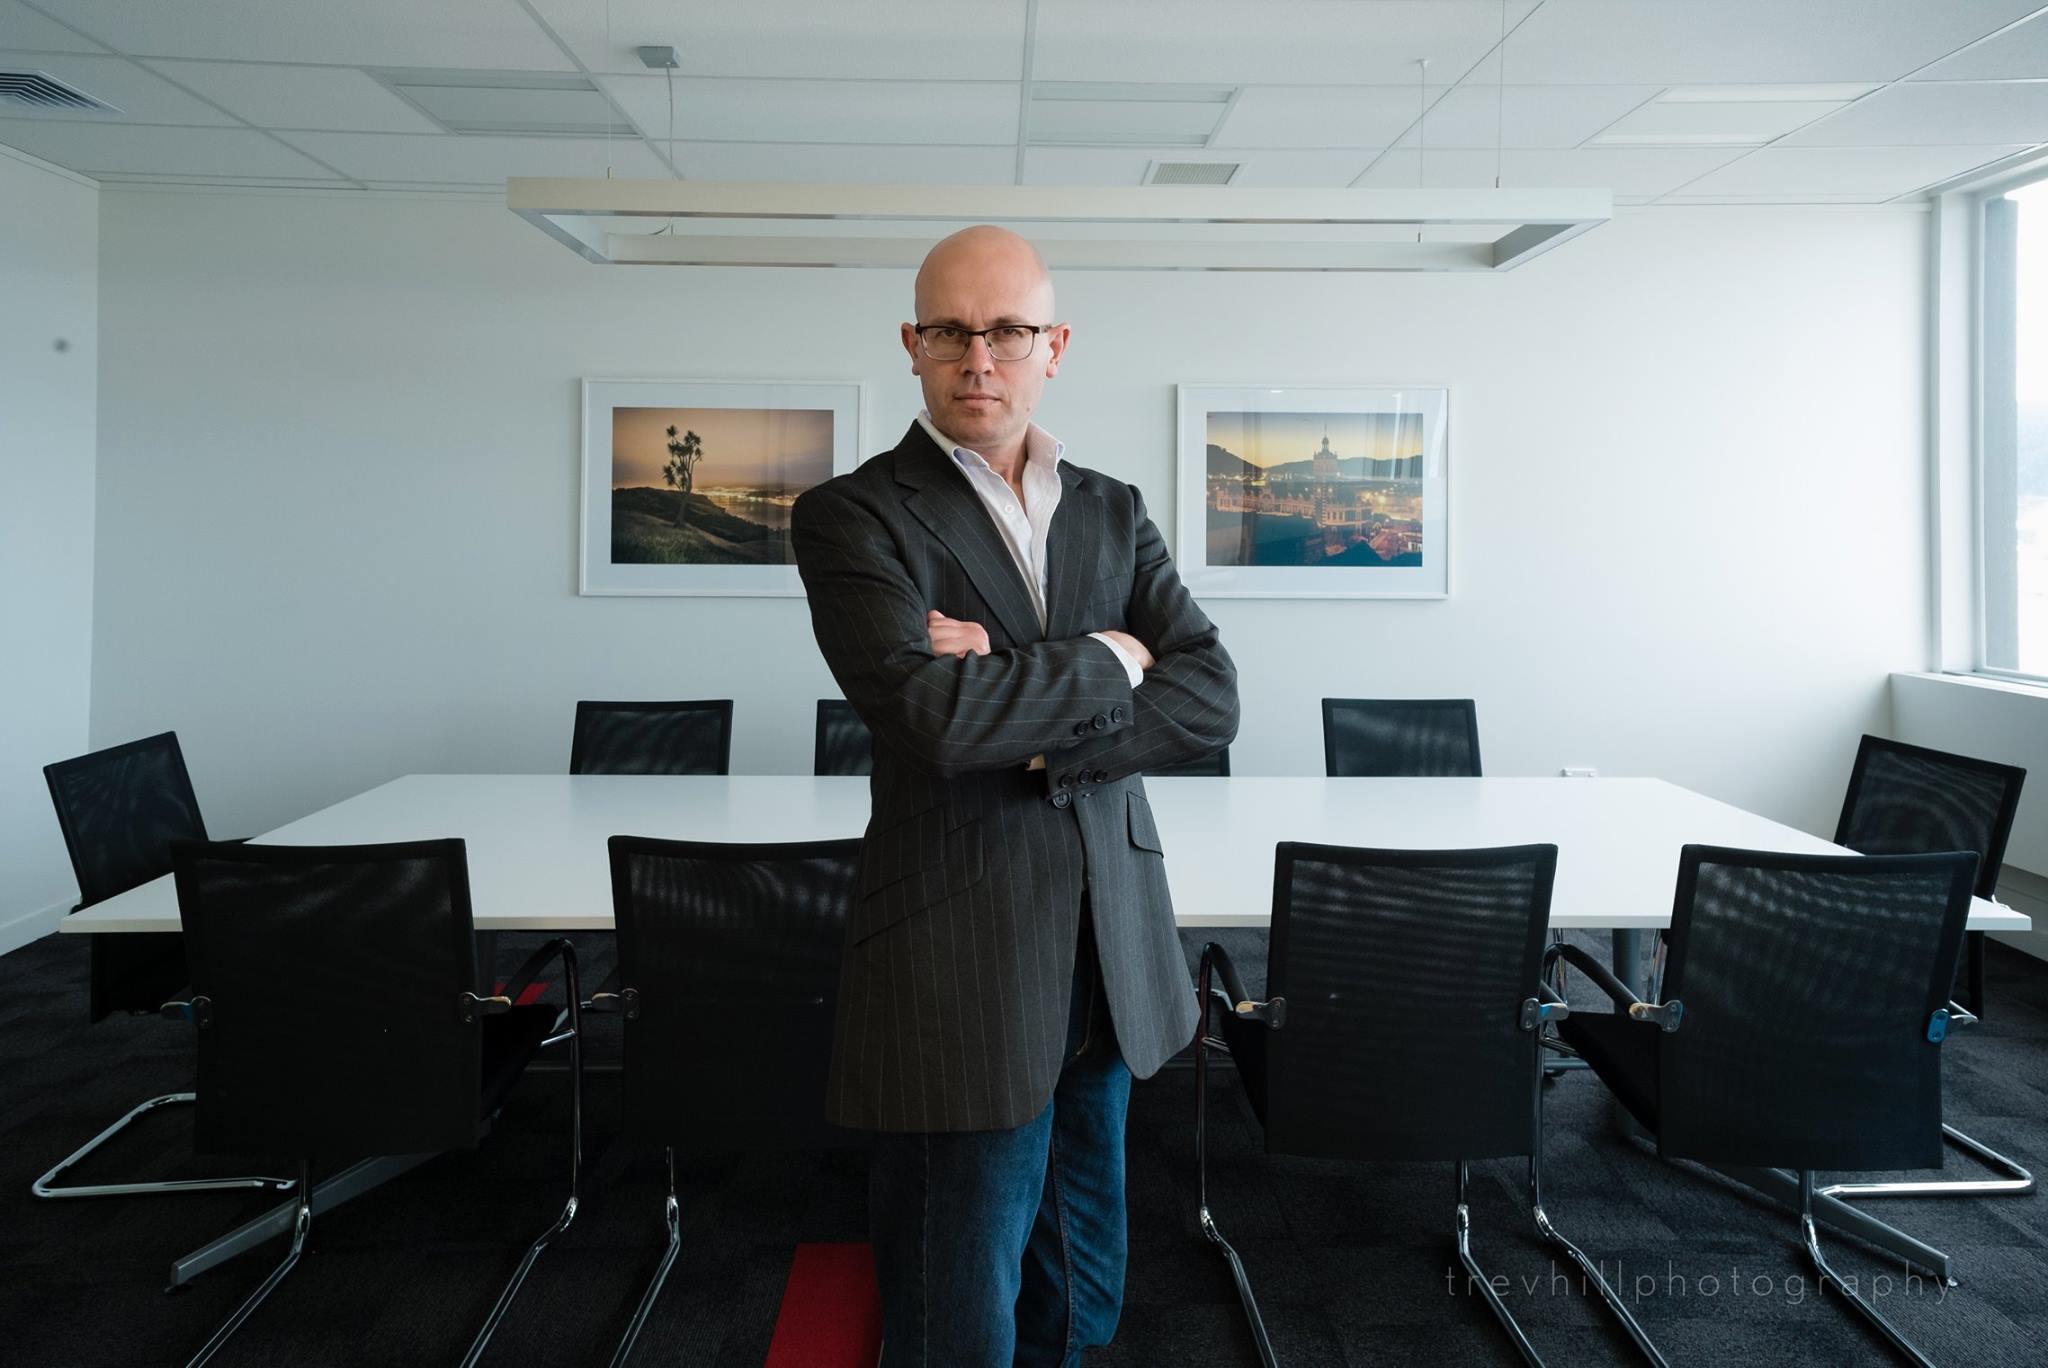 Colliers International boardroom Dunedin Landscapes